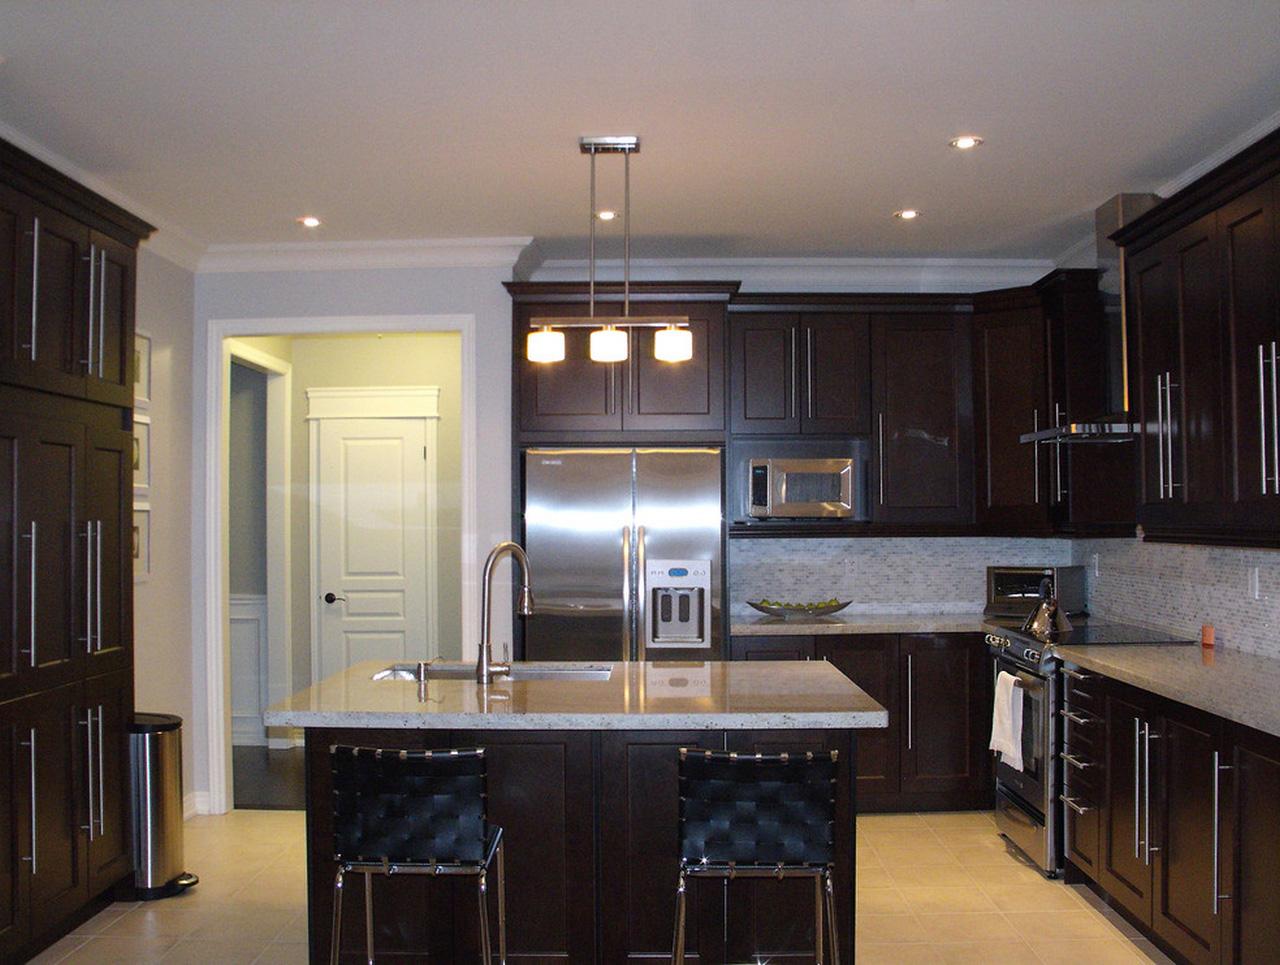 Espresso-Kitchen-Cabinets-espresso-kitchen-cabinets-Kitchen-Contemporary-with-Bianco-Carrara-marble-mini